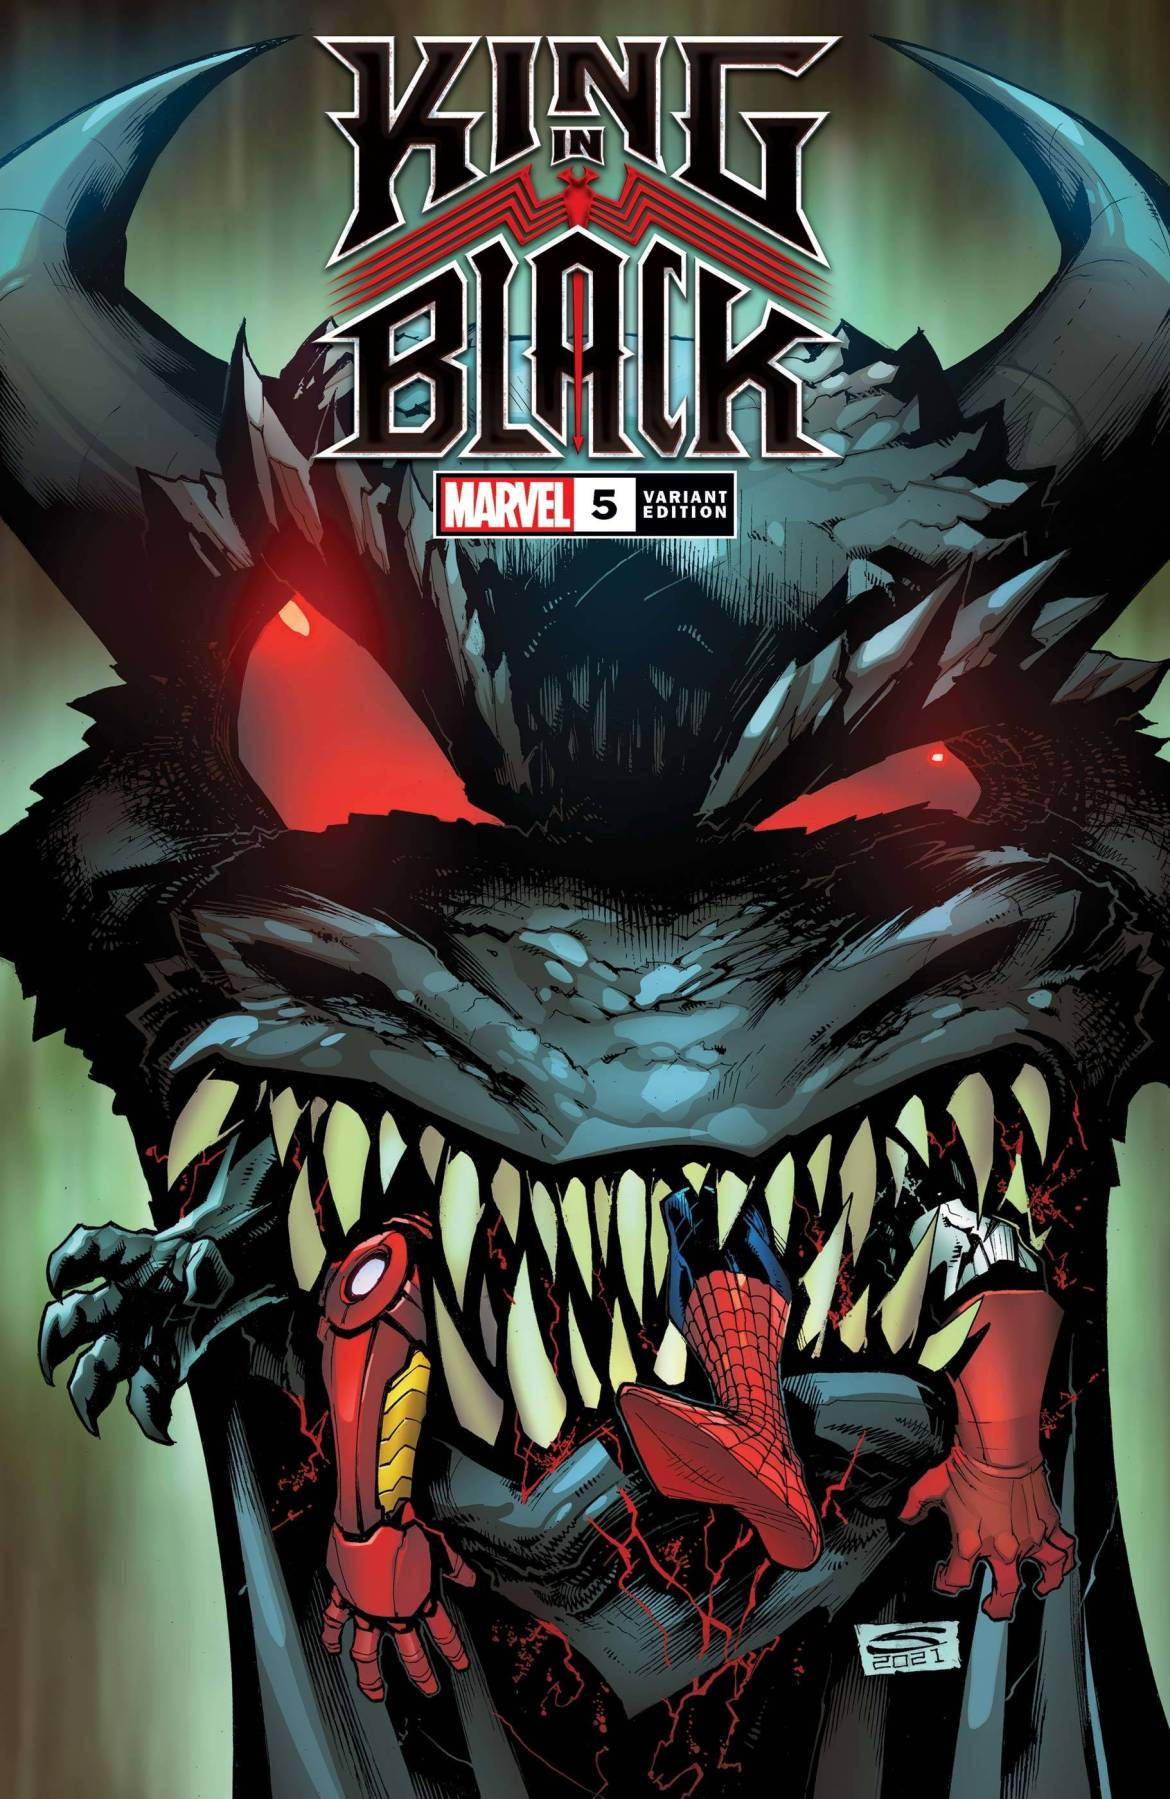 STL180520 ComicList: Marvel Comics New Releases for 04/07/2021